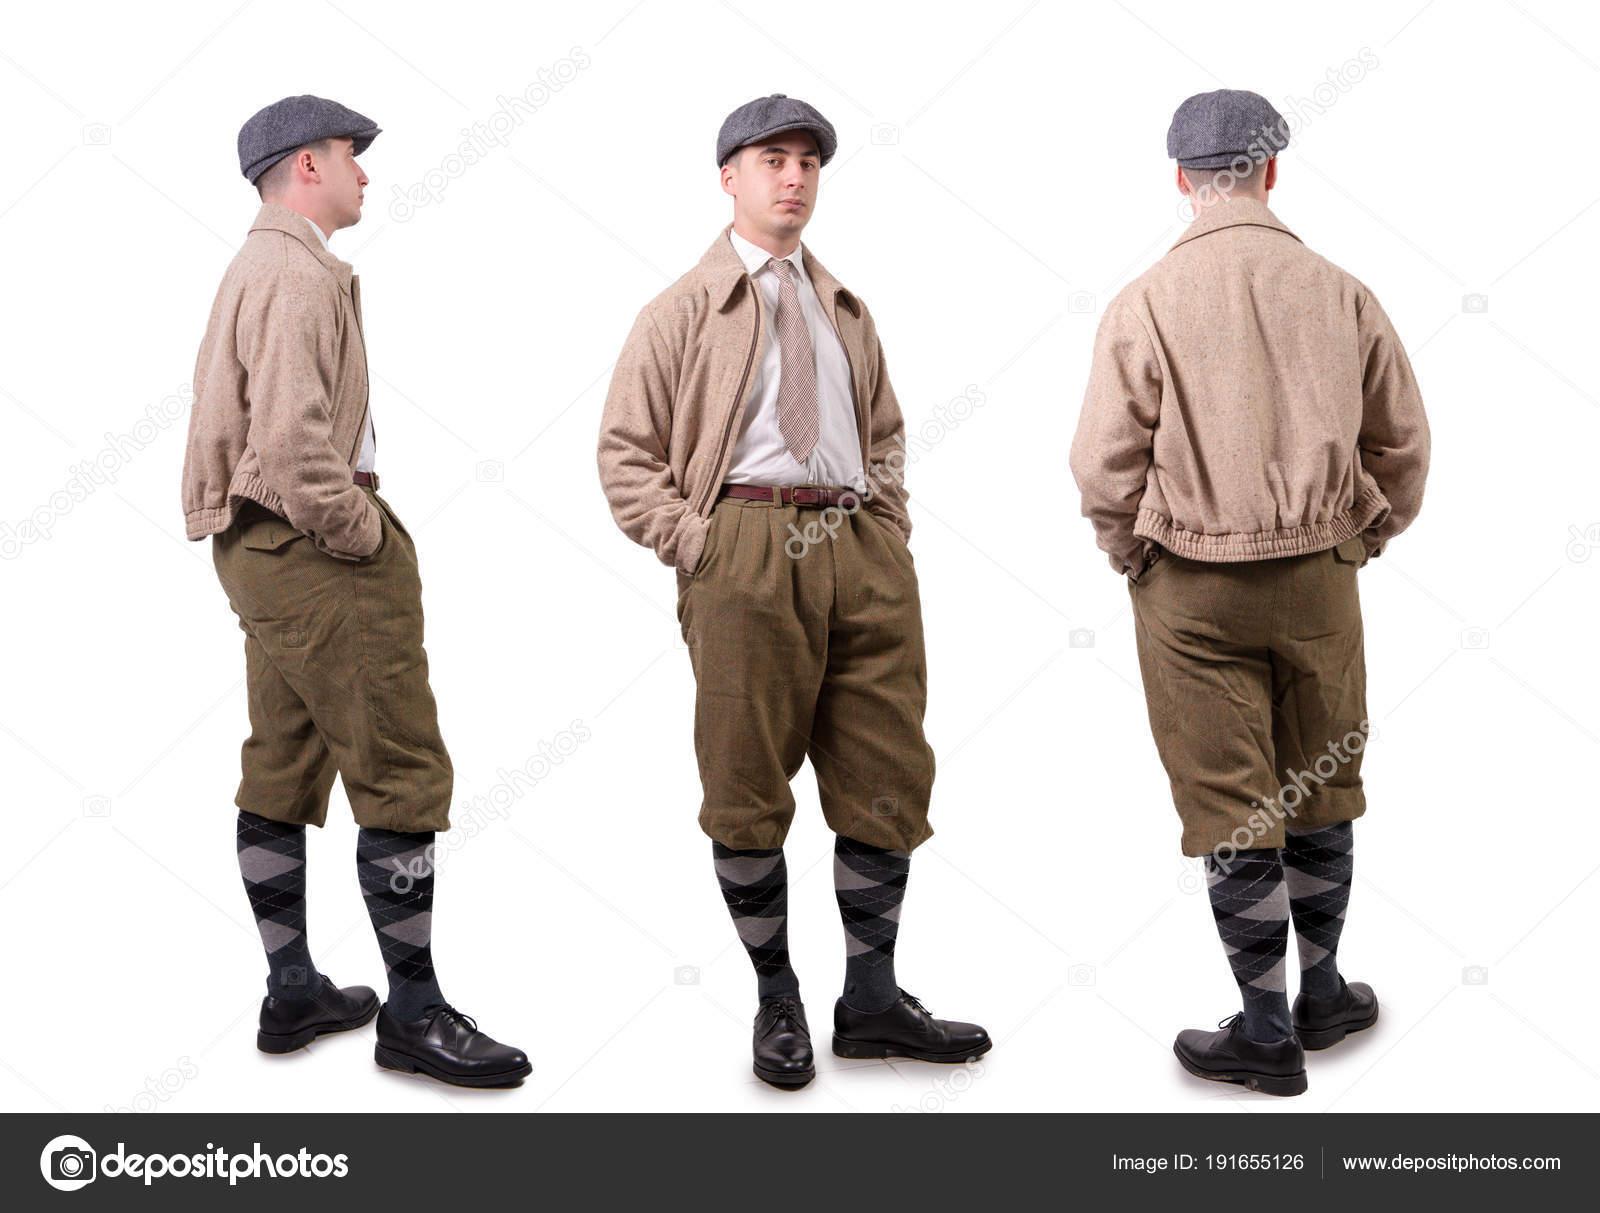 Vintage Kleding.Jonge Man In Vintage Kleding Met Hoed 1940 Stijl Op Wit